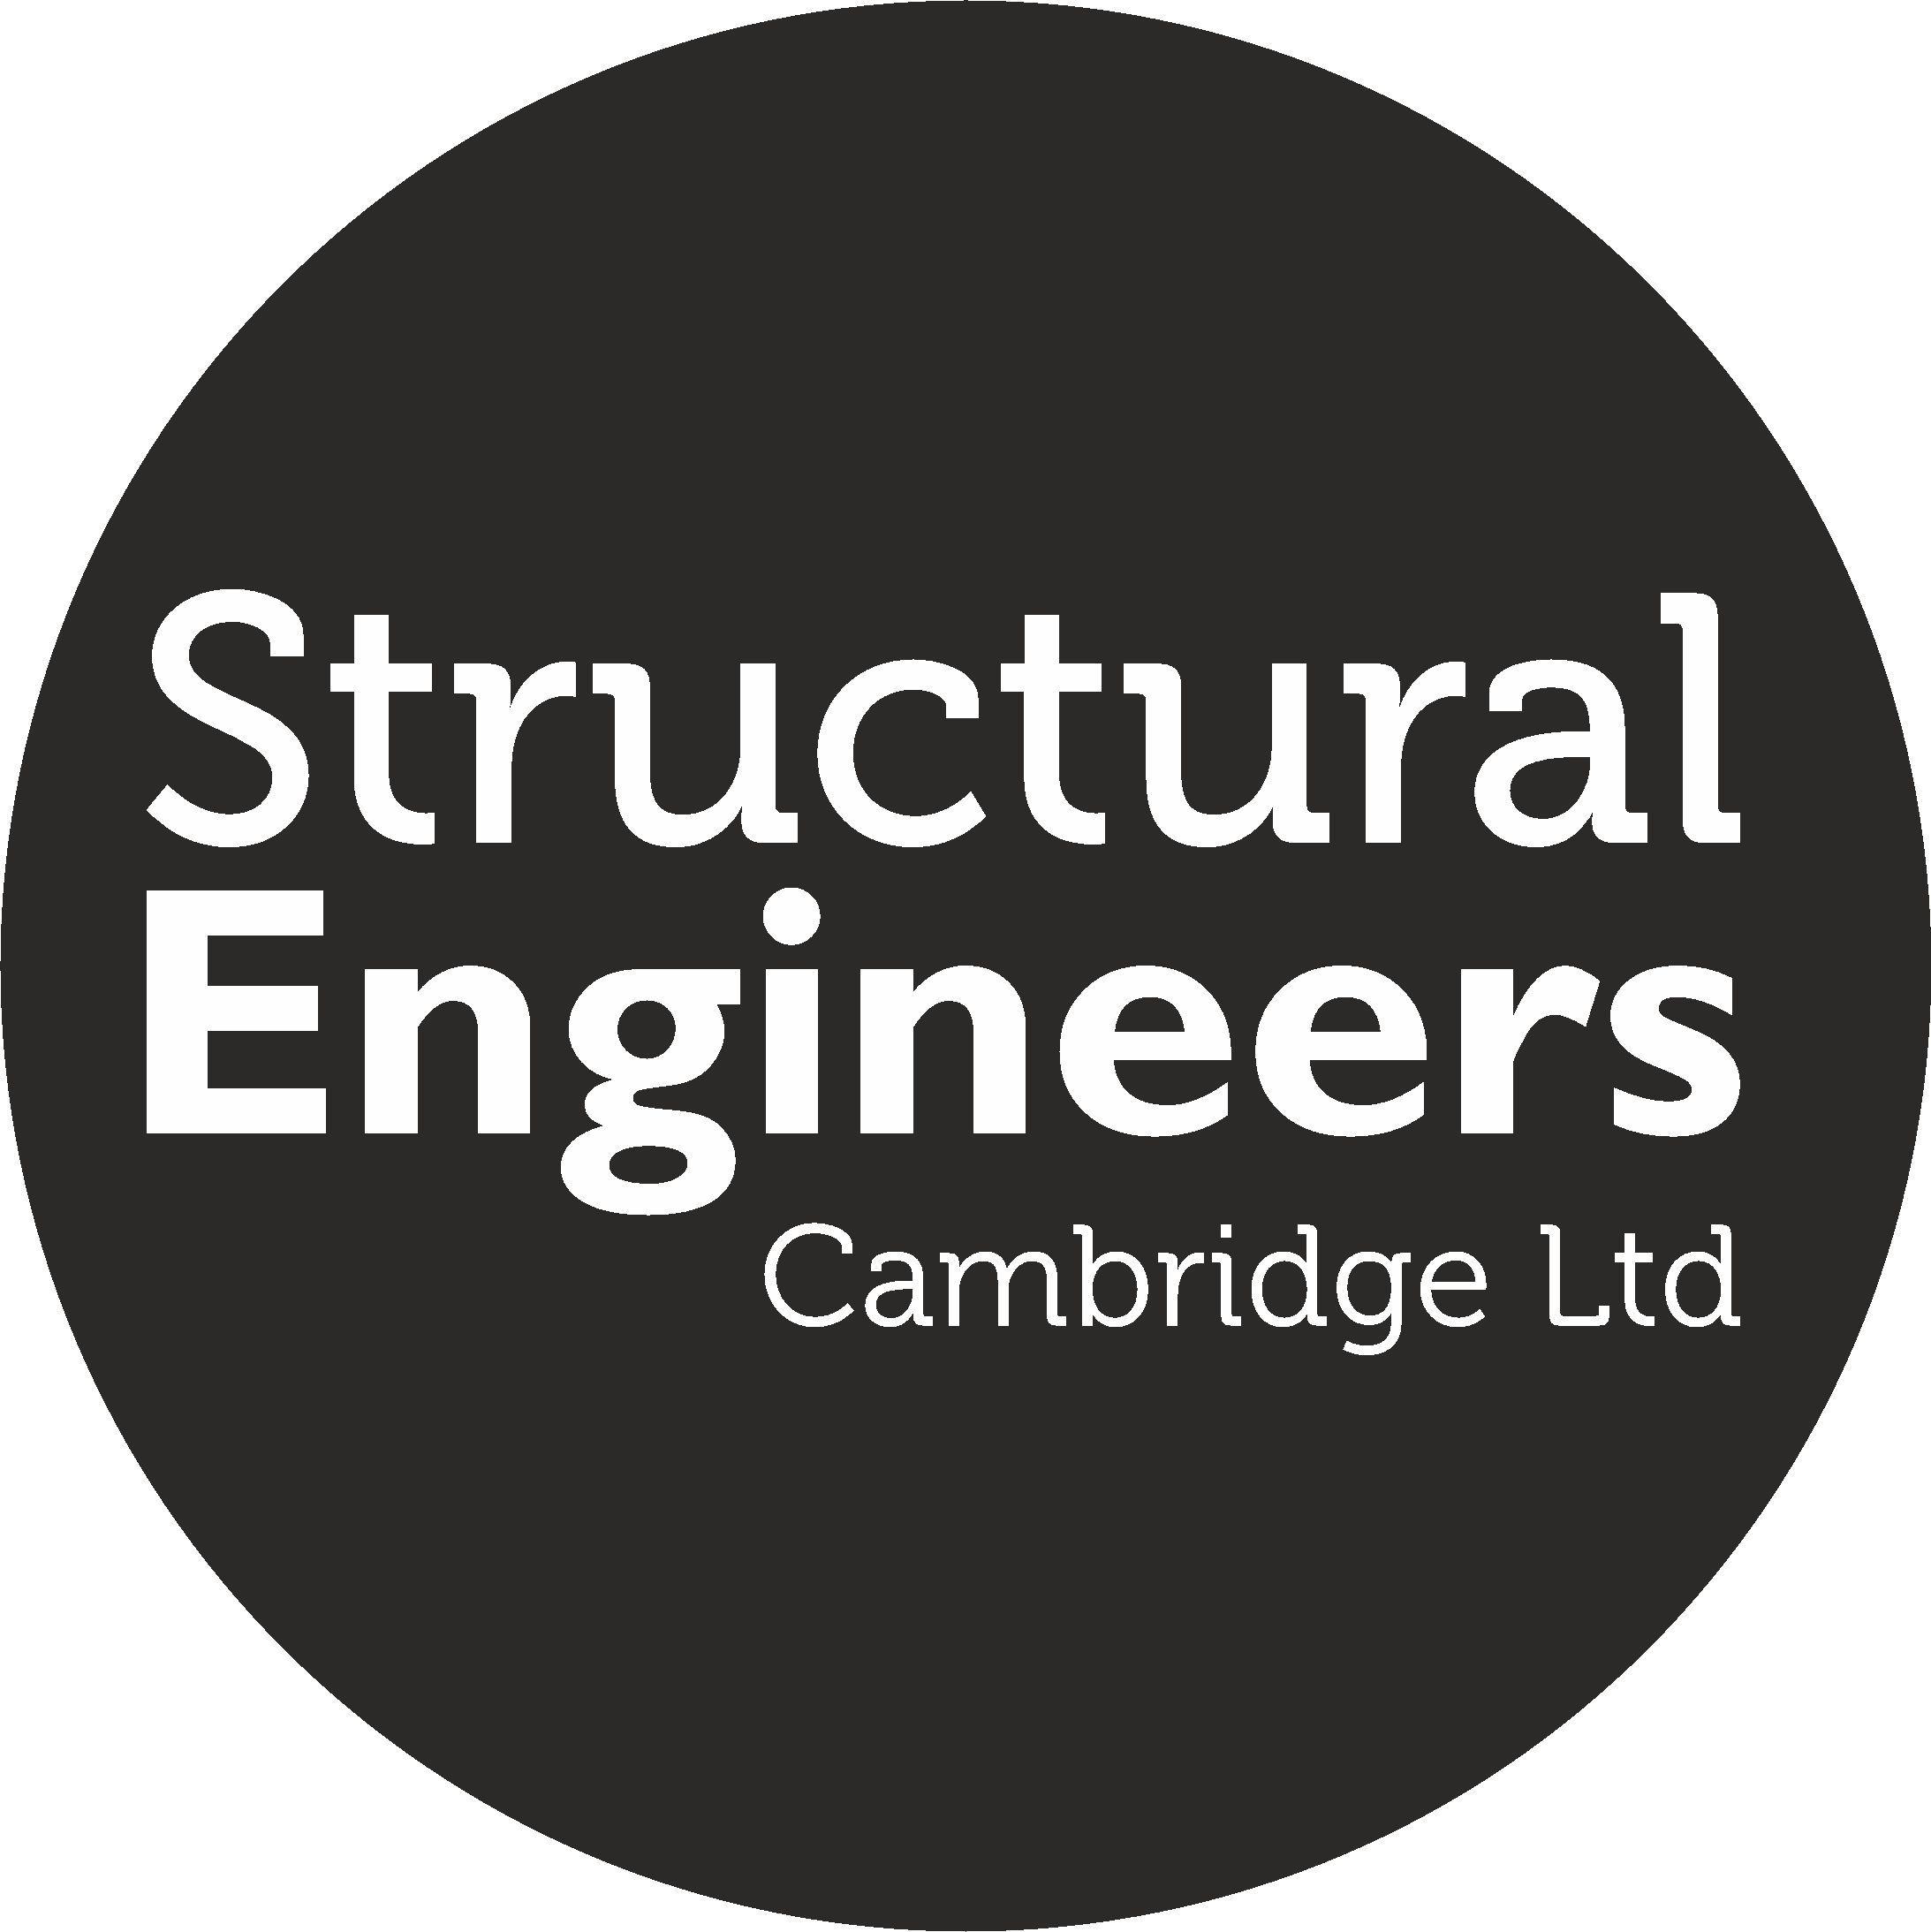 Andy Chapman- Structural Engineers Cambridge Ltd